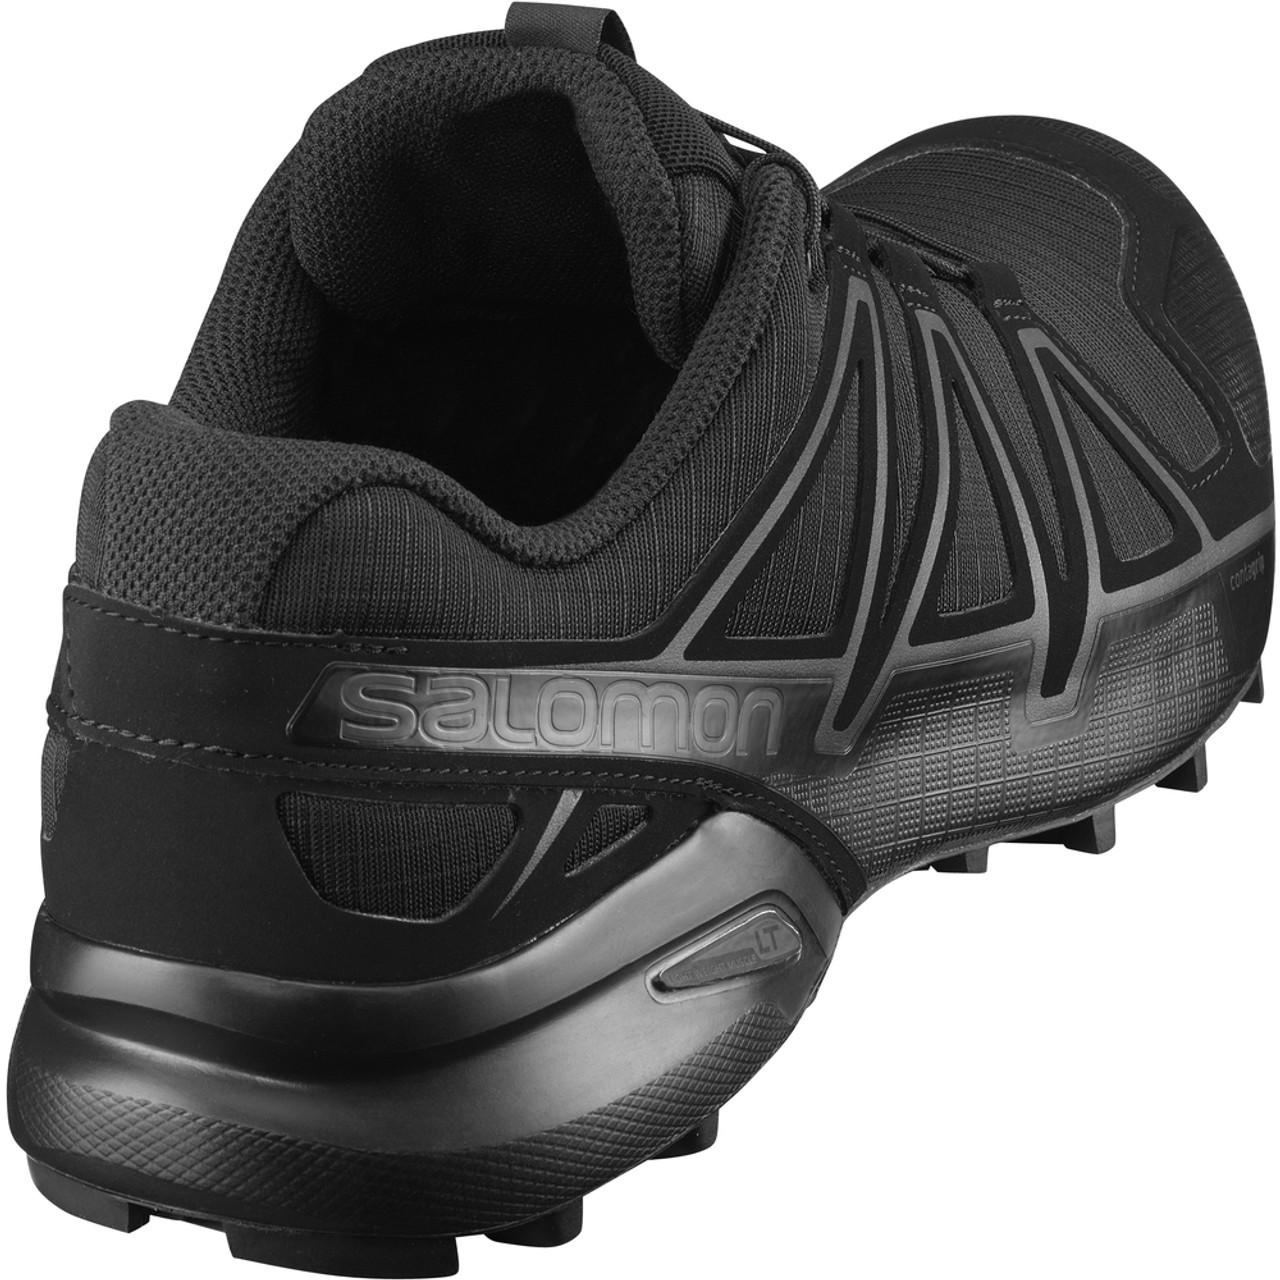 Salomon Speedcross 4 Wide Forces, Black